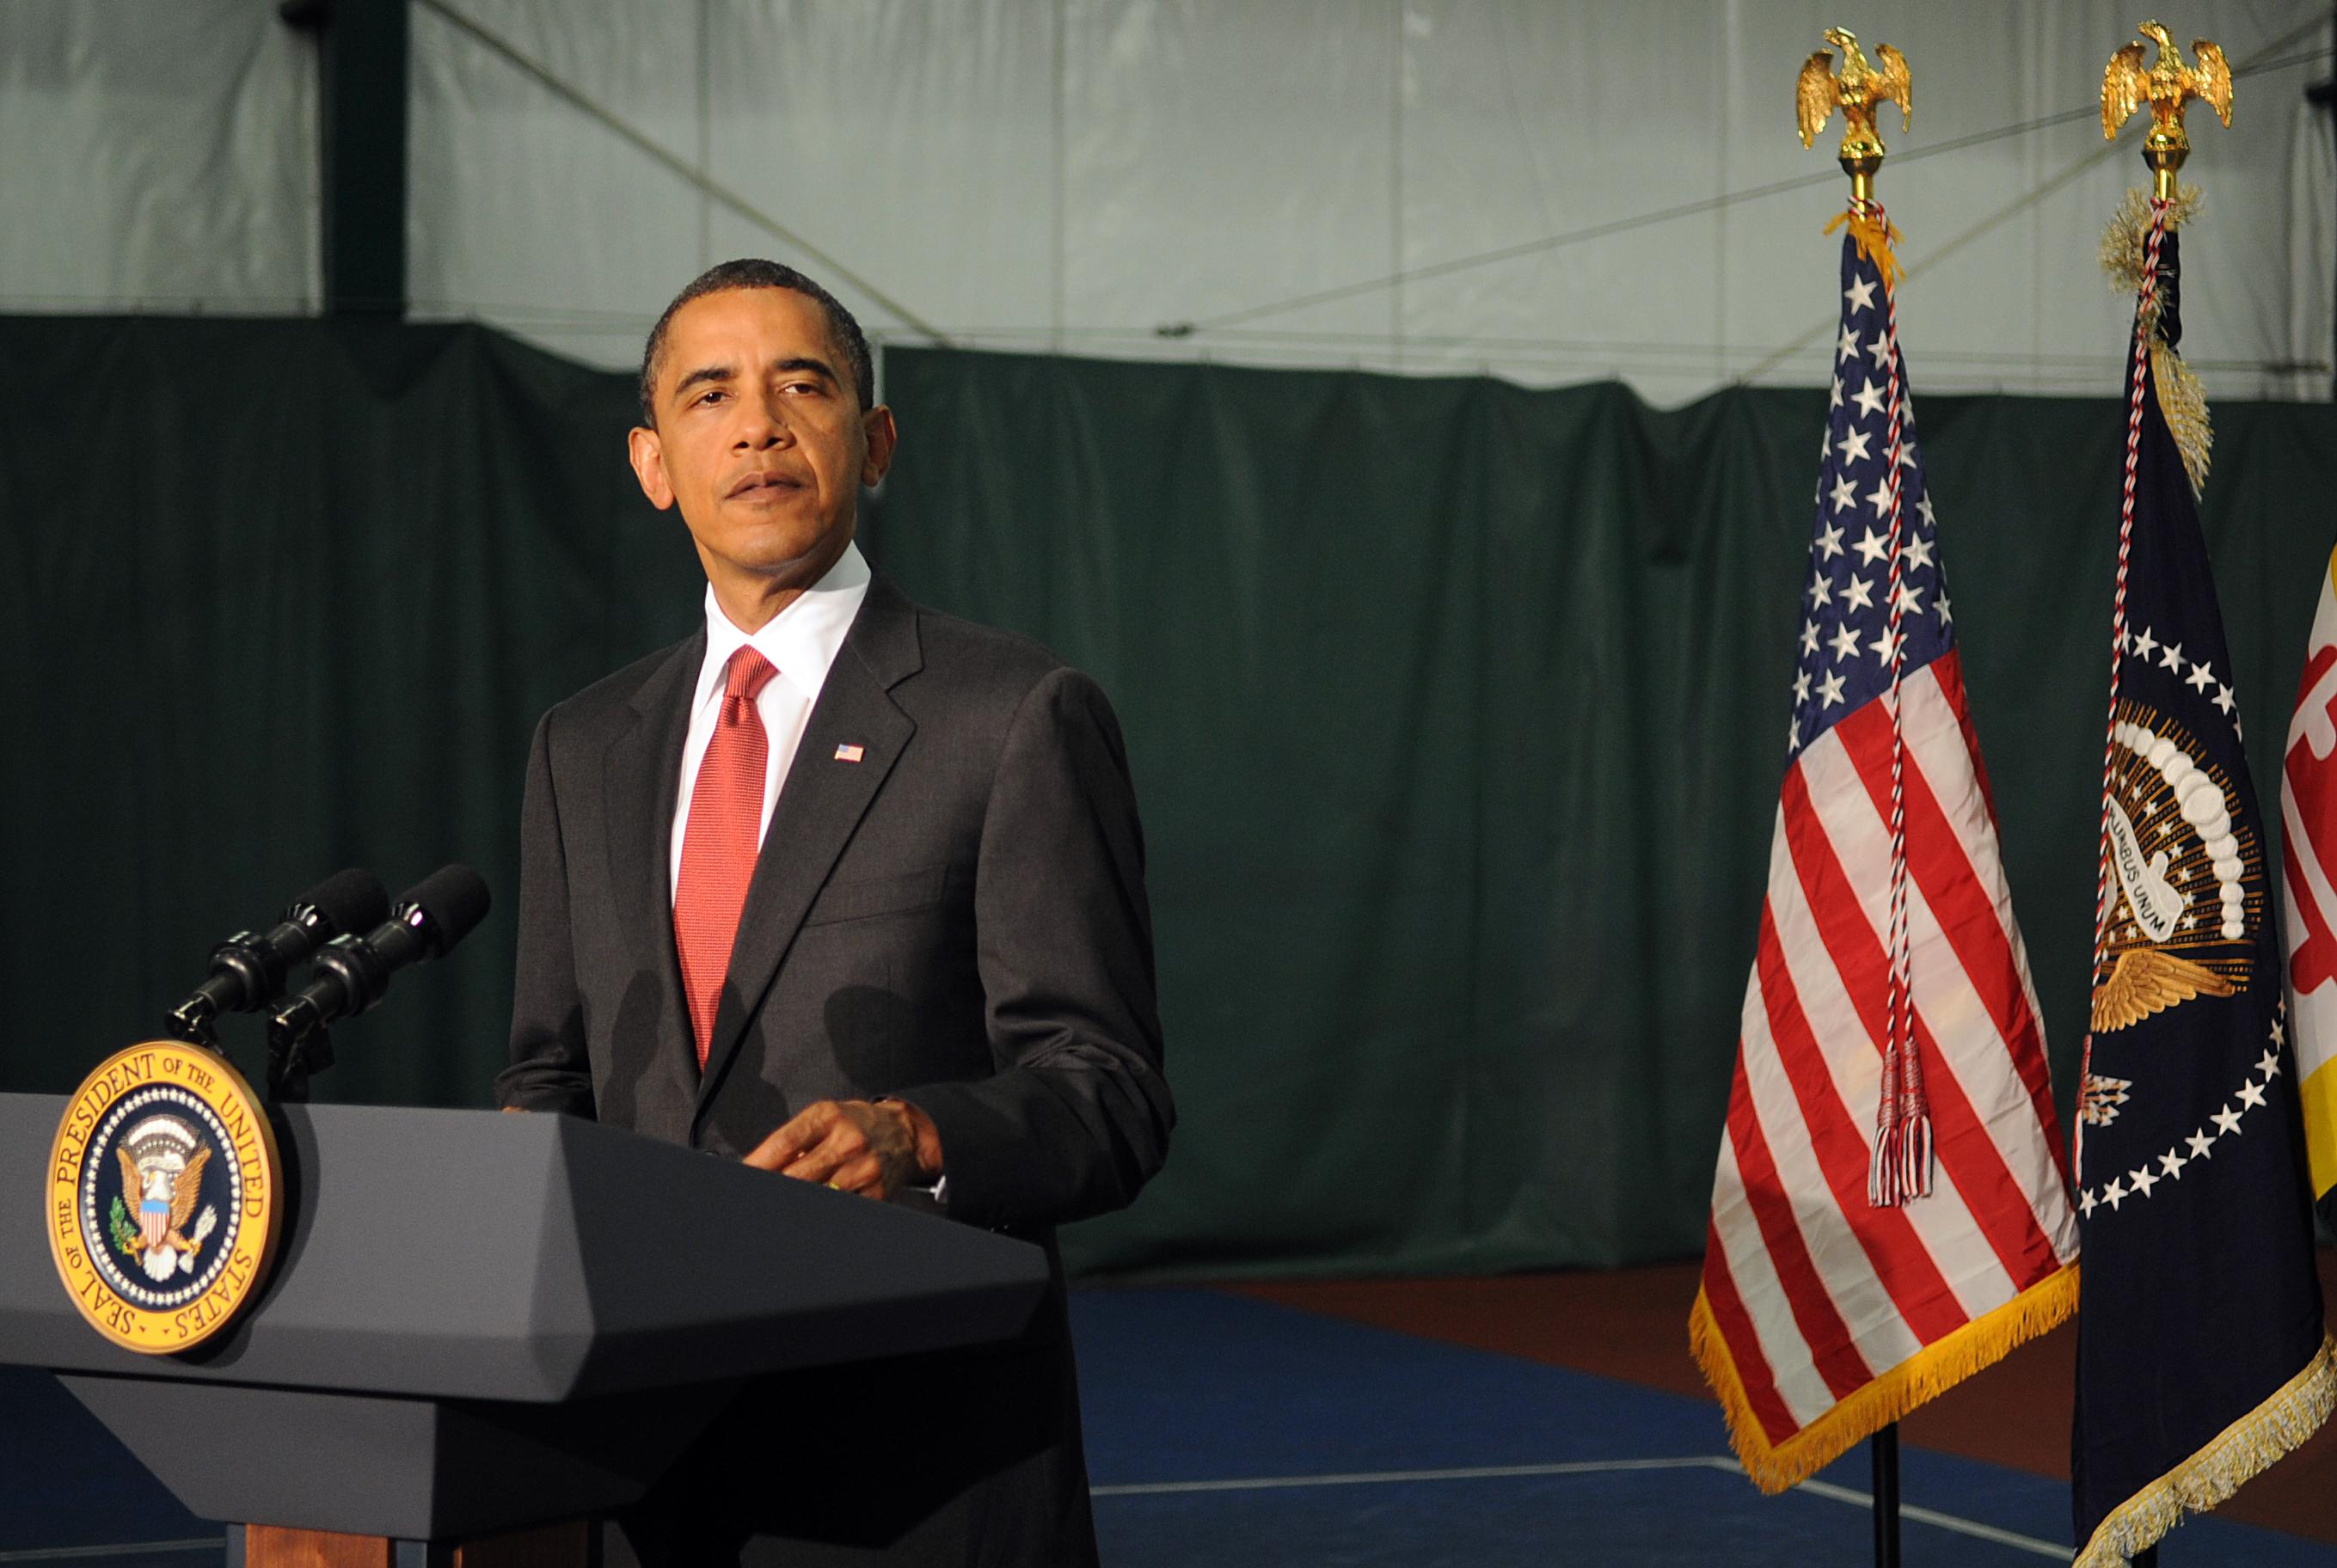 President Obama's Memorial Day Speech